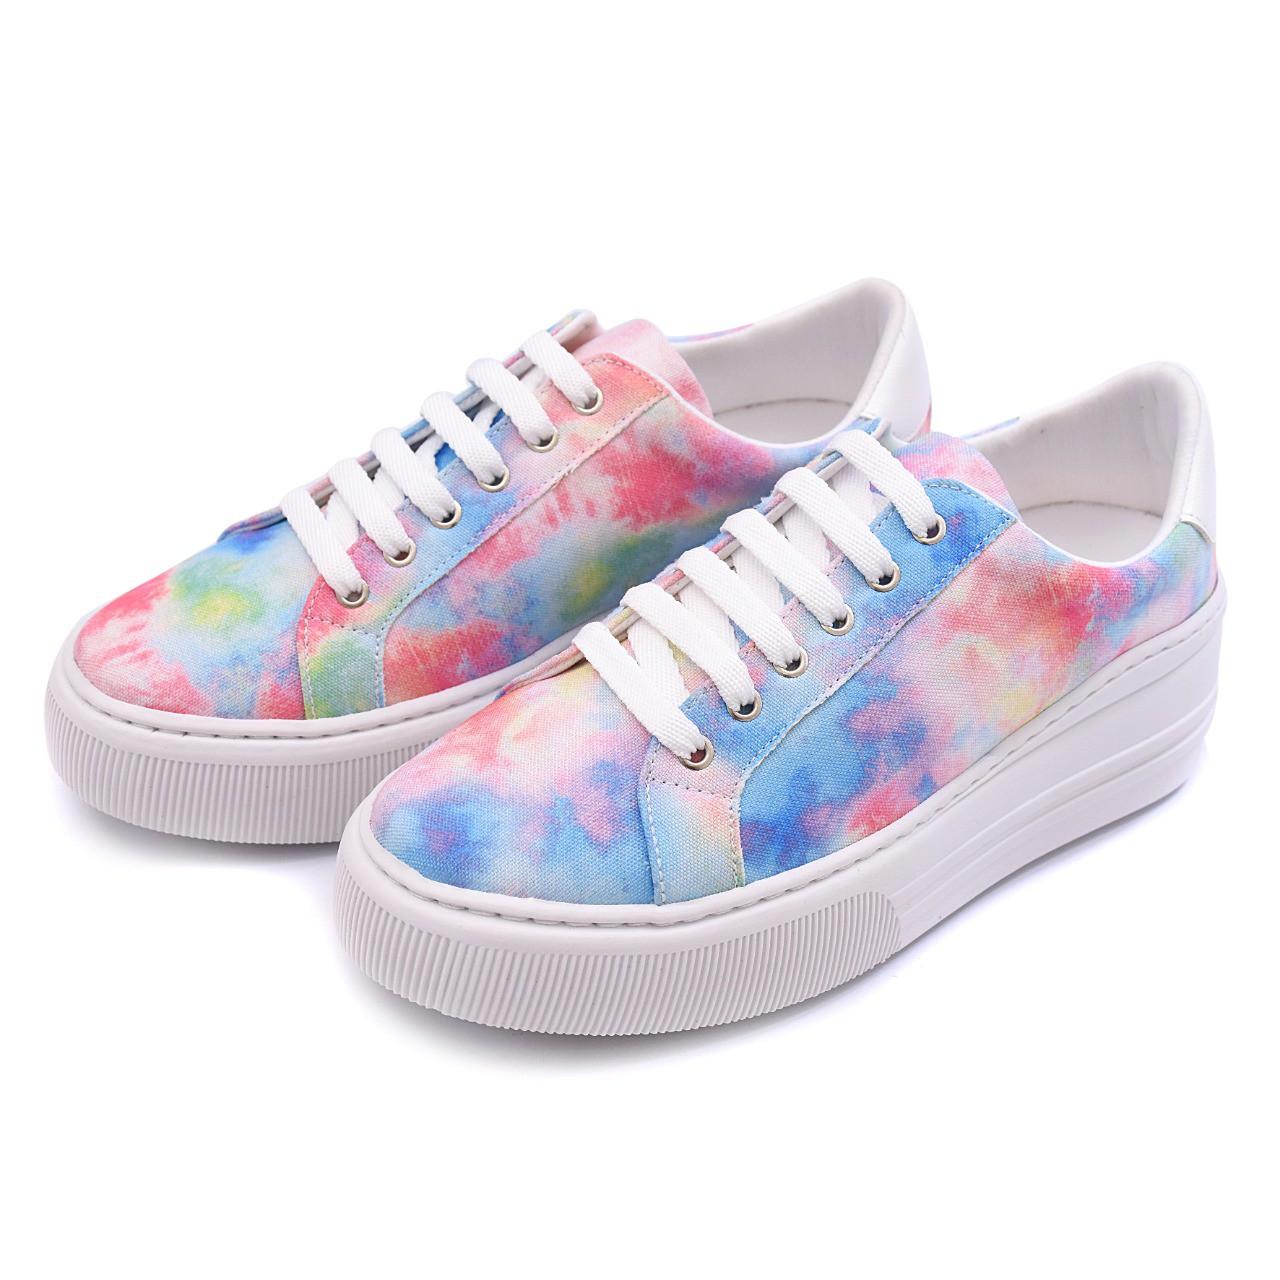 Tênis Colorido Gommix Shoes 088 Tie Dye Sola Alta